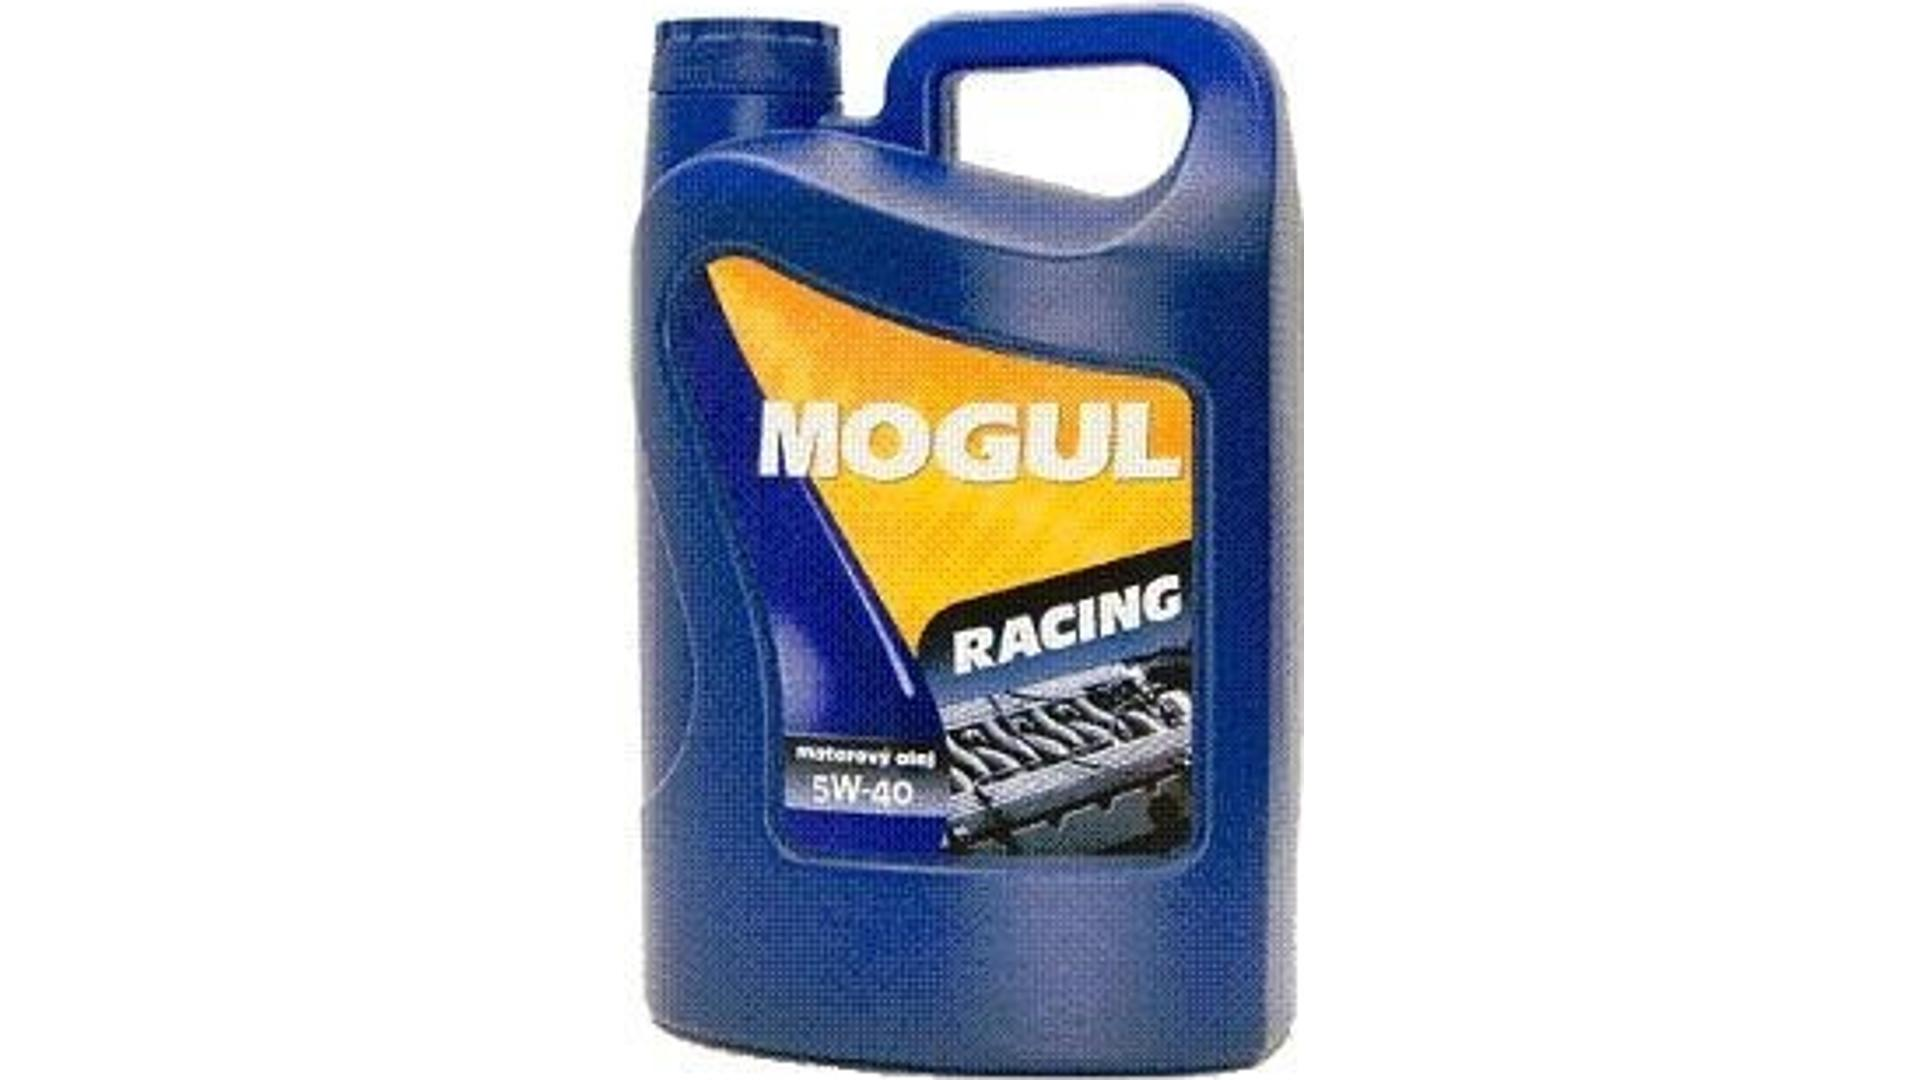 MOGUL RACING 5W-40 /4